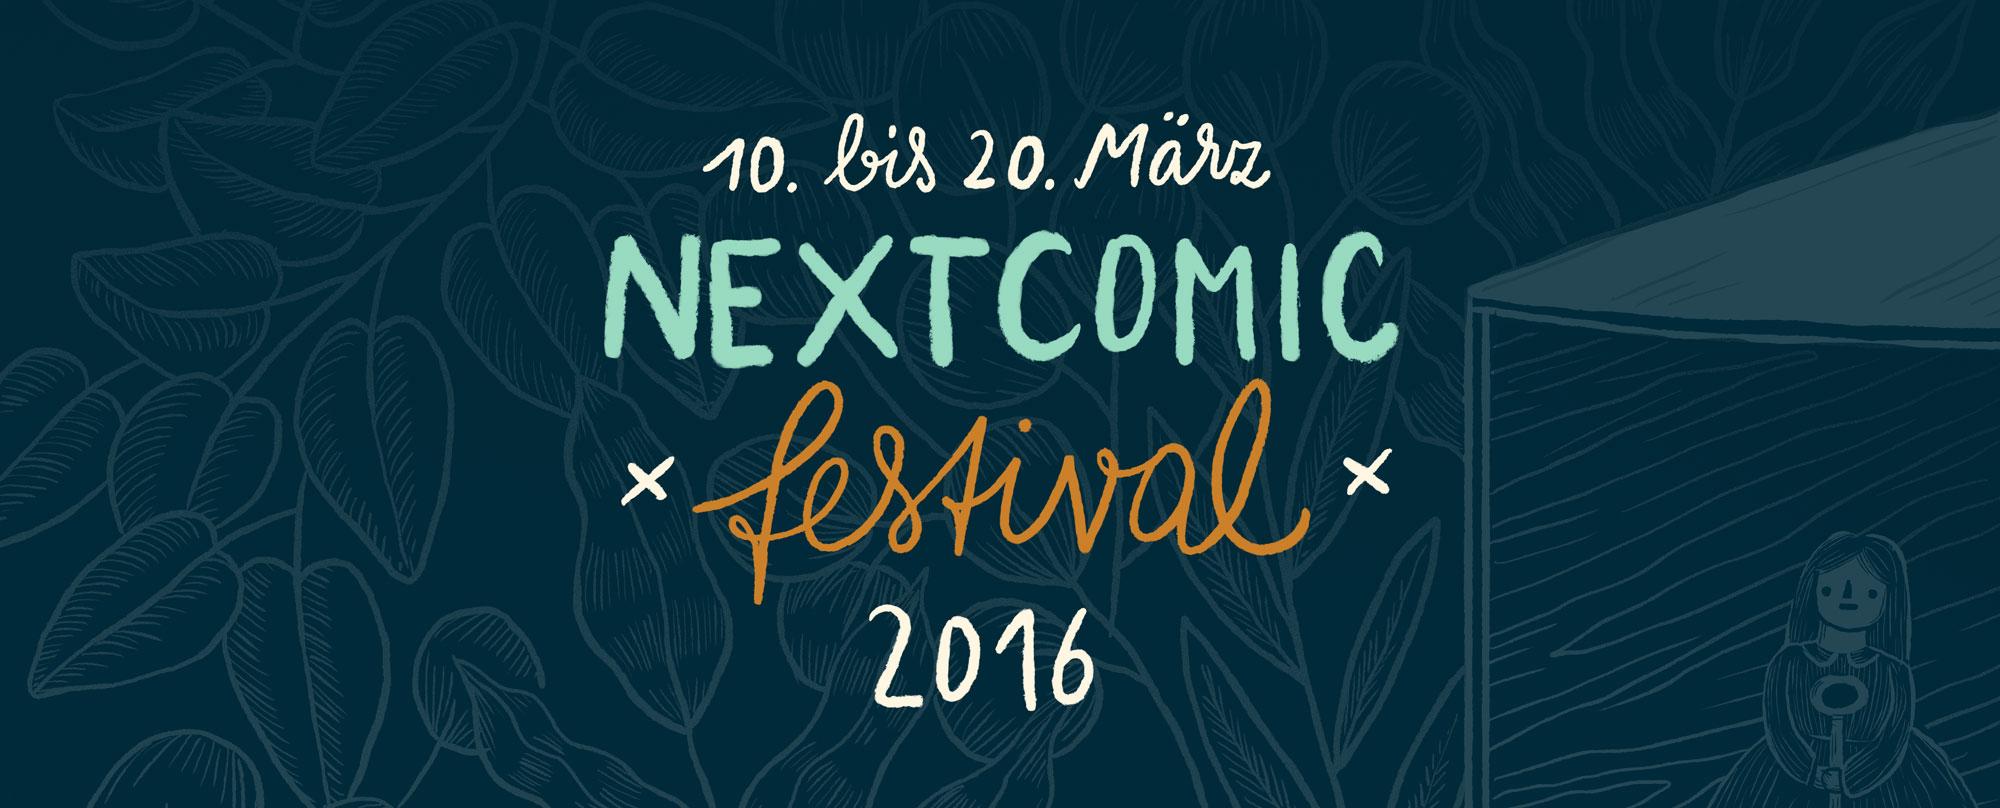 NEXTCOMIC-Festival 2016